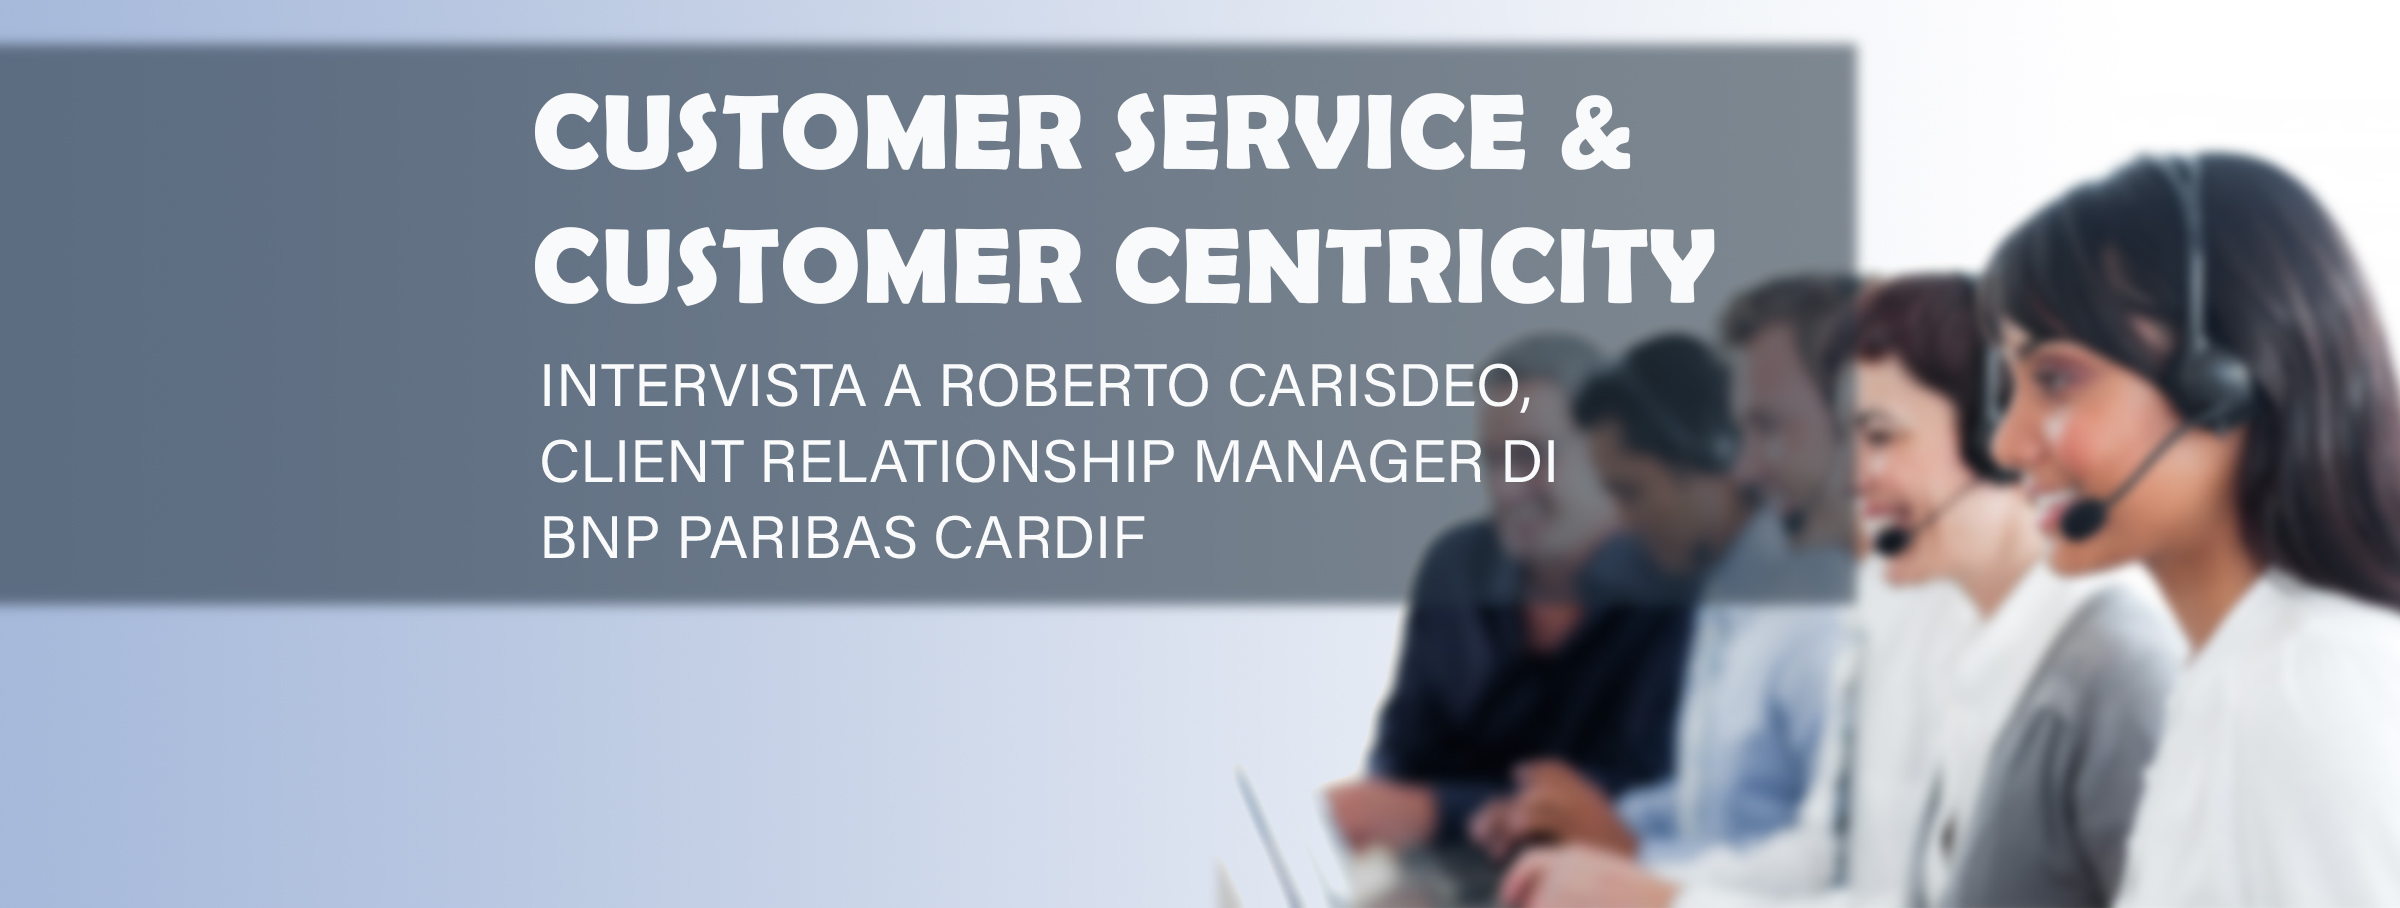 customer service & customer centricity